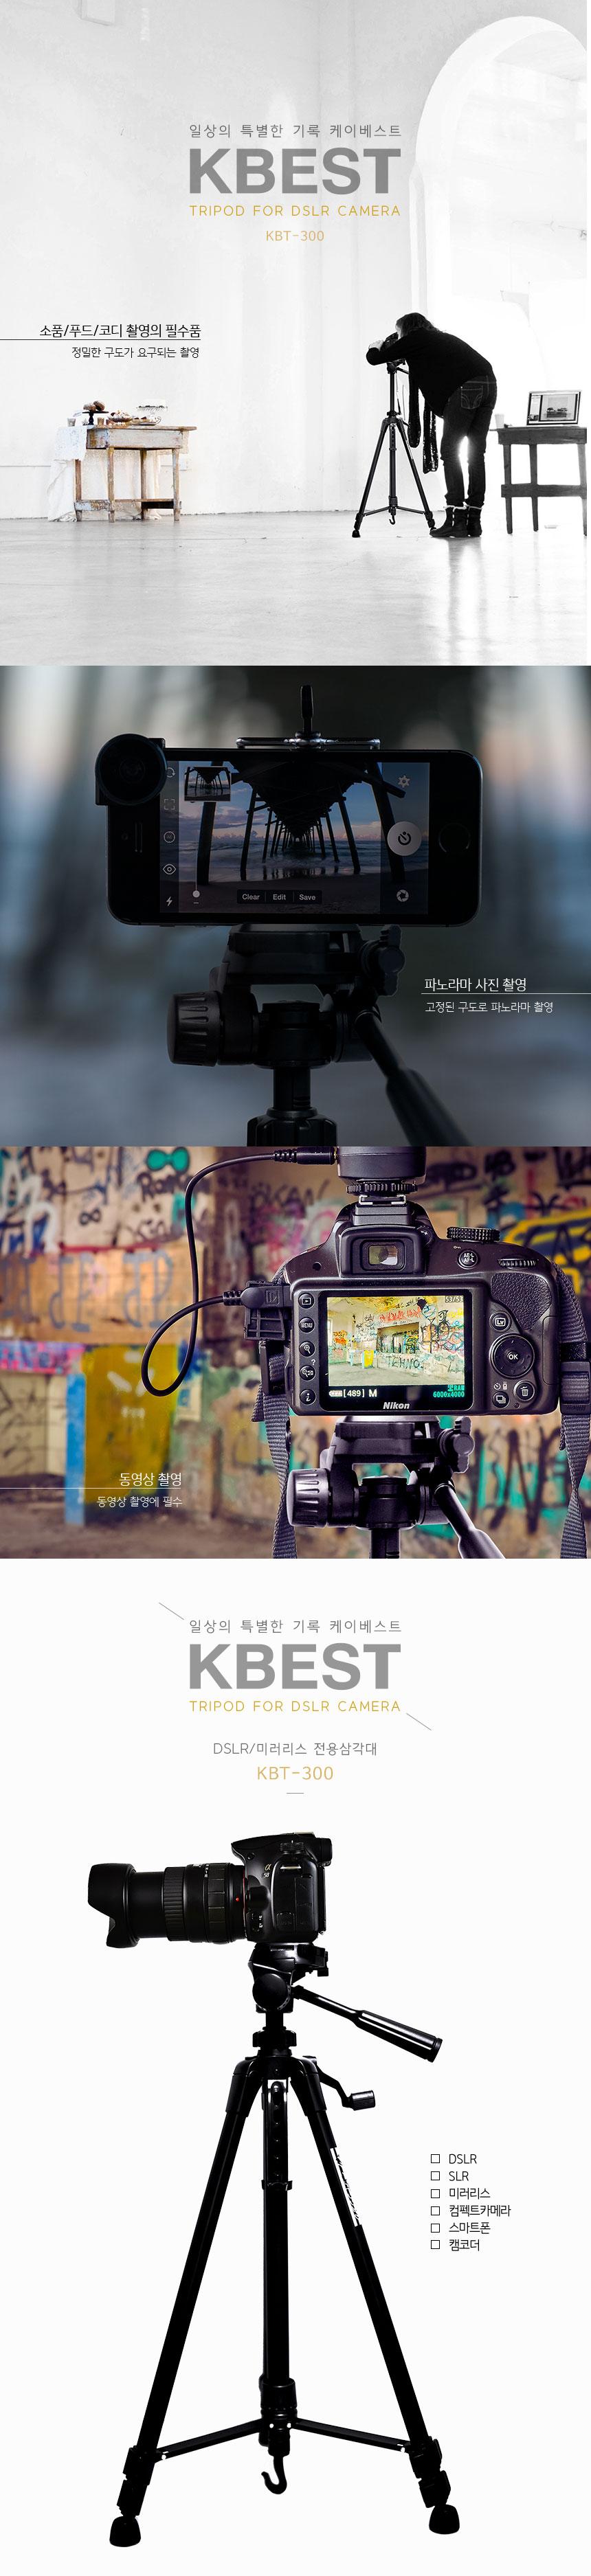 DSLR 미러리스 스마트폰 삼각대 KBT-30038,000원-케이베스트키덜트/취미, 카메라/캠, 카메라 액세서리, 삼각대/스탠드바보사랑DSLR 미러리스 스마트폰 삼각대 KBT-30038,000원-케이베스트키덜트/취미, 카메라/캠, 카메라 액세서리, 삼각대/스탠드바보사랑